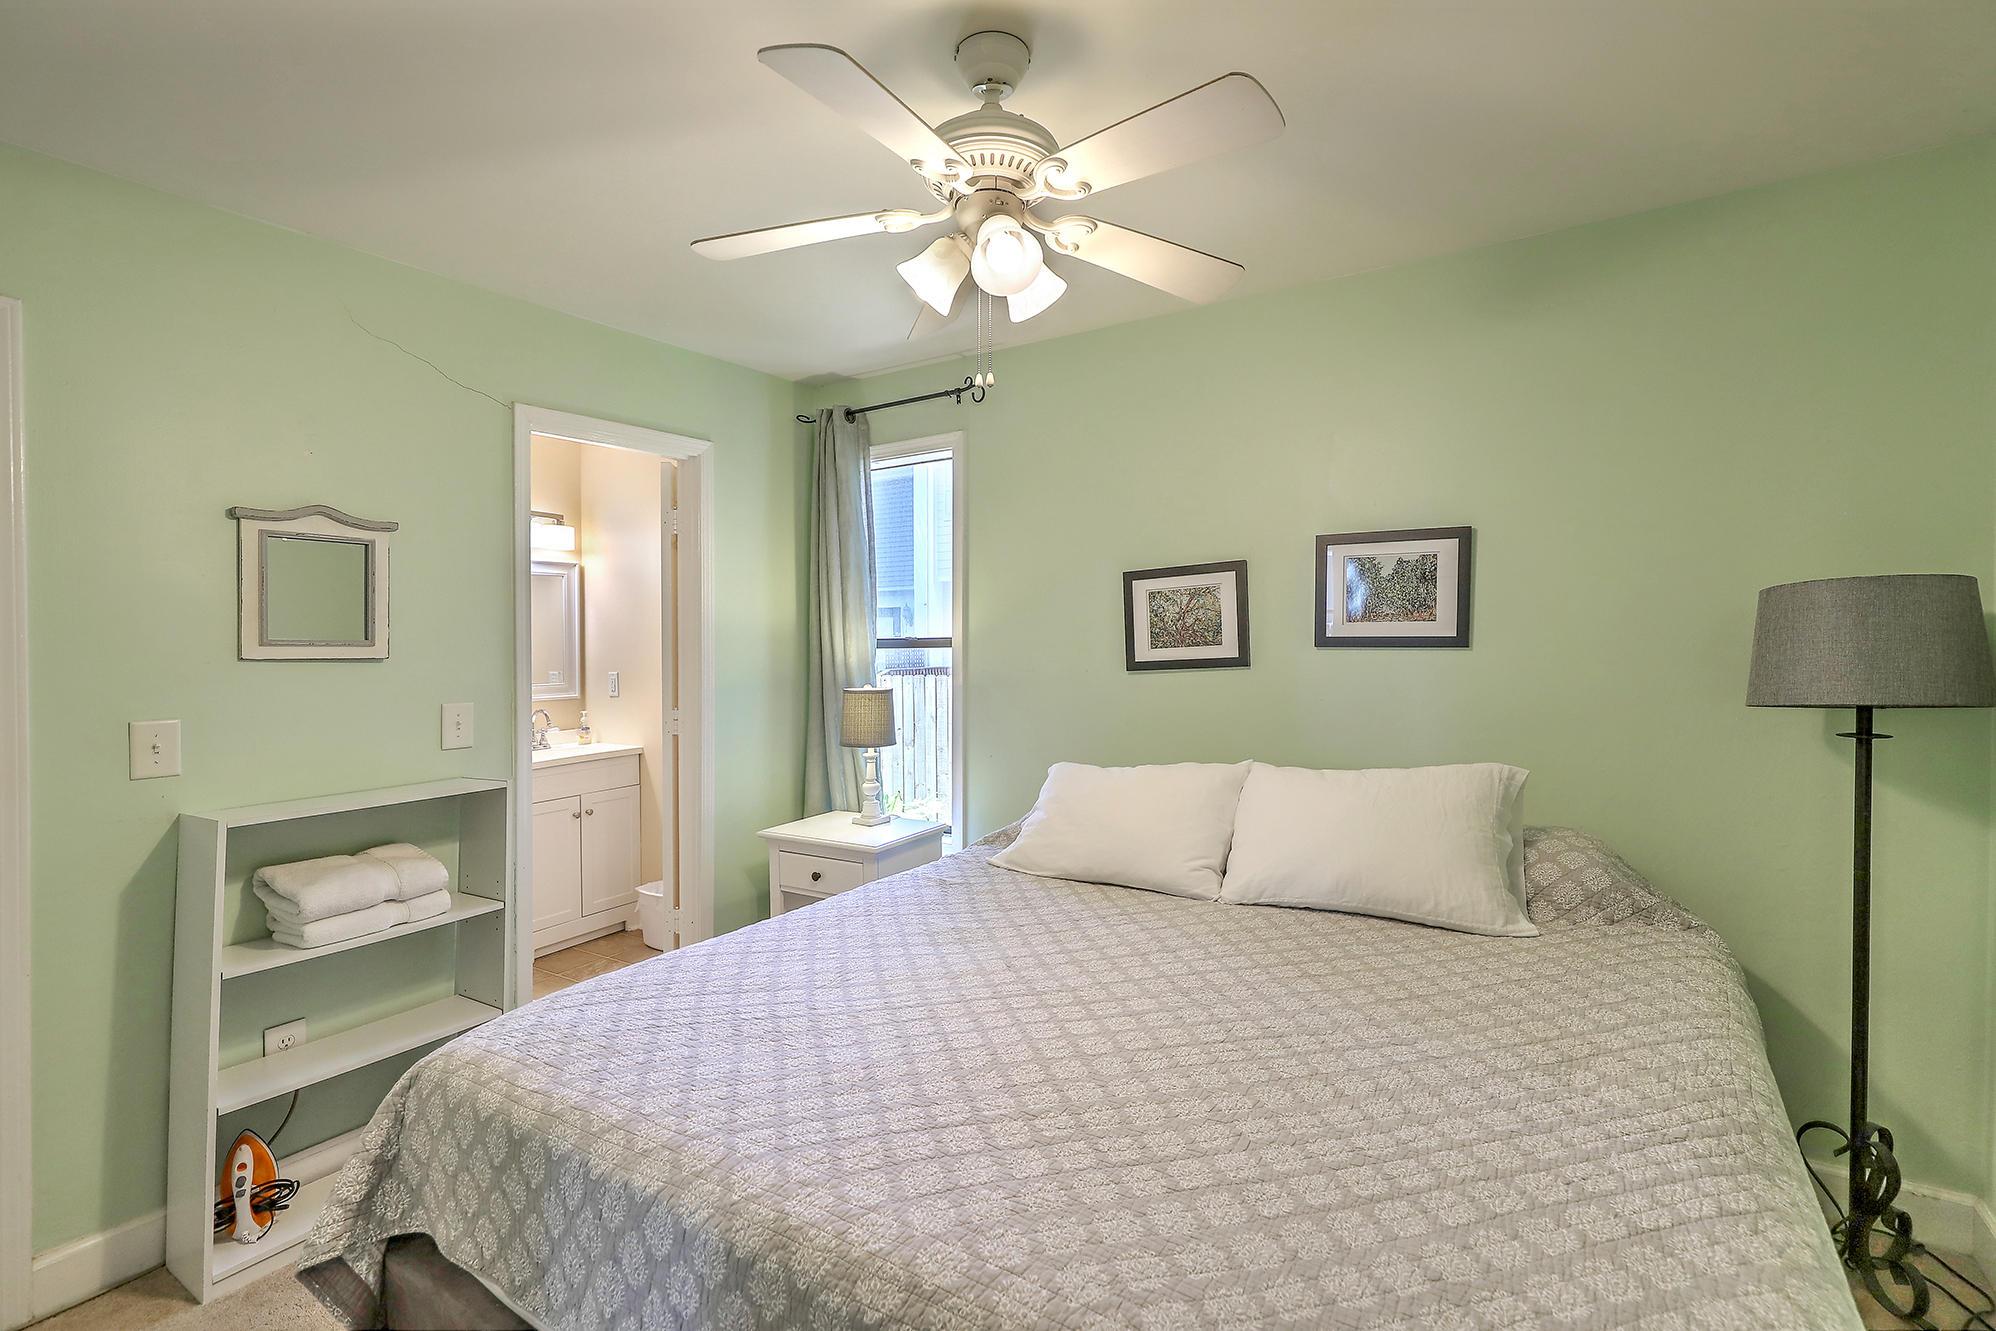 Marsh Grass Condominiums Homes For Sale - 1501 Ben Sawyer, Mount Pleasant, SC - 6